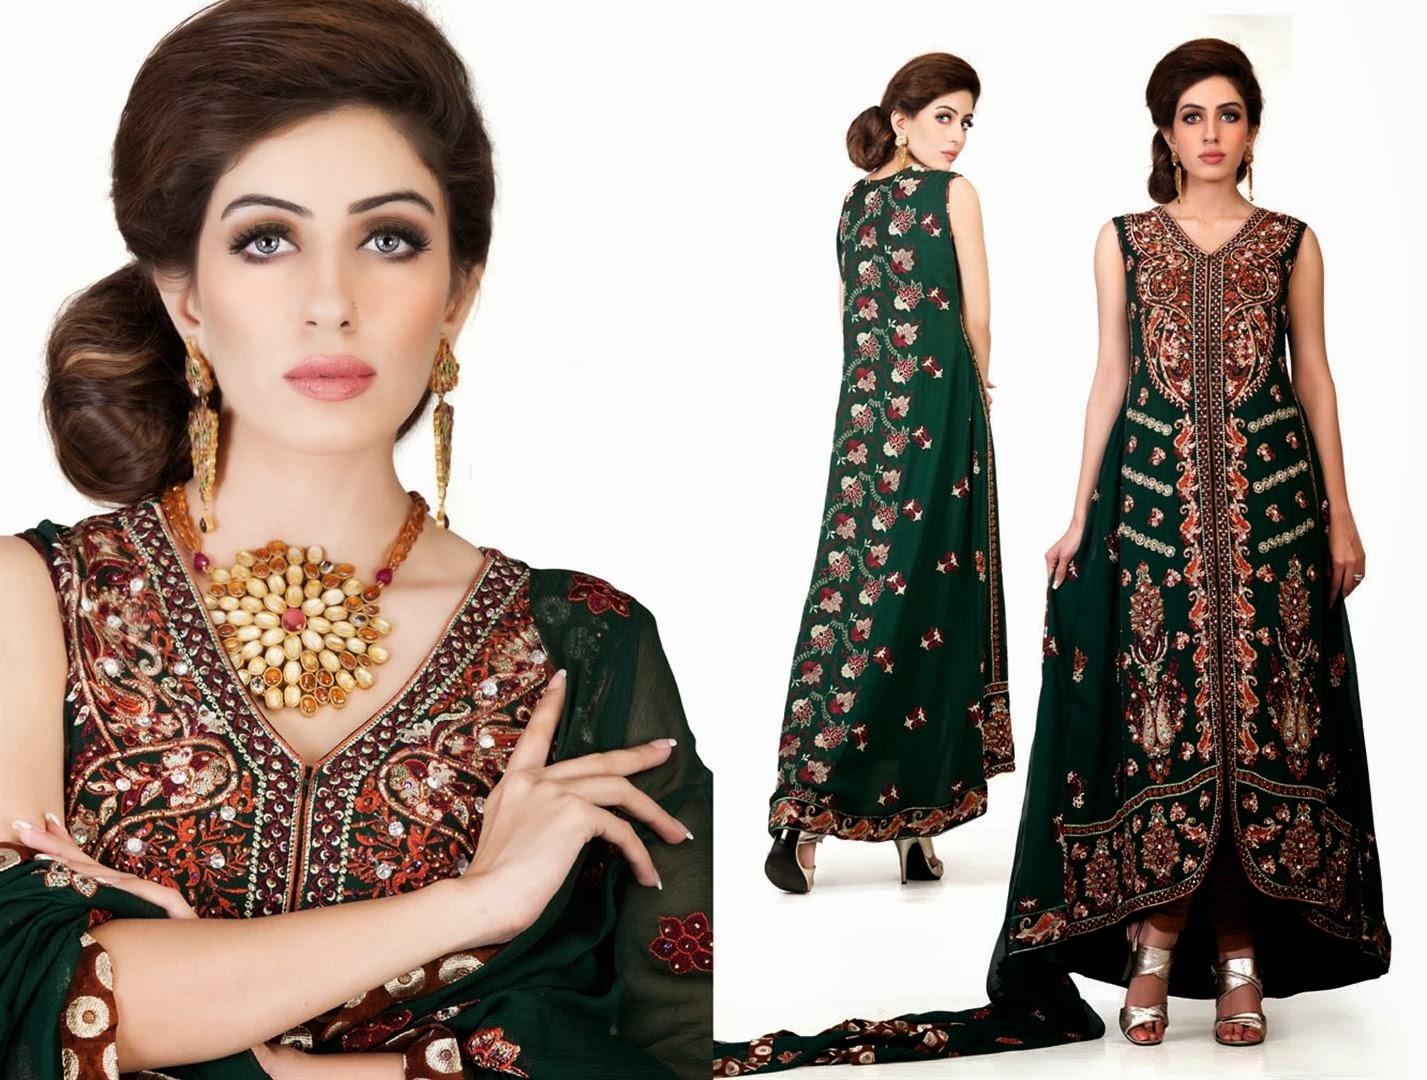 Mehndi Clothes Designs 2014 | Open Shirts Designs Pakistani 2014 Images